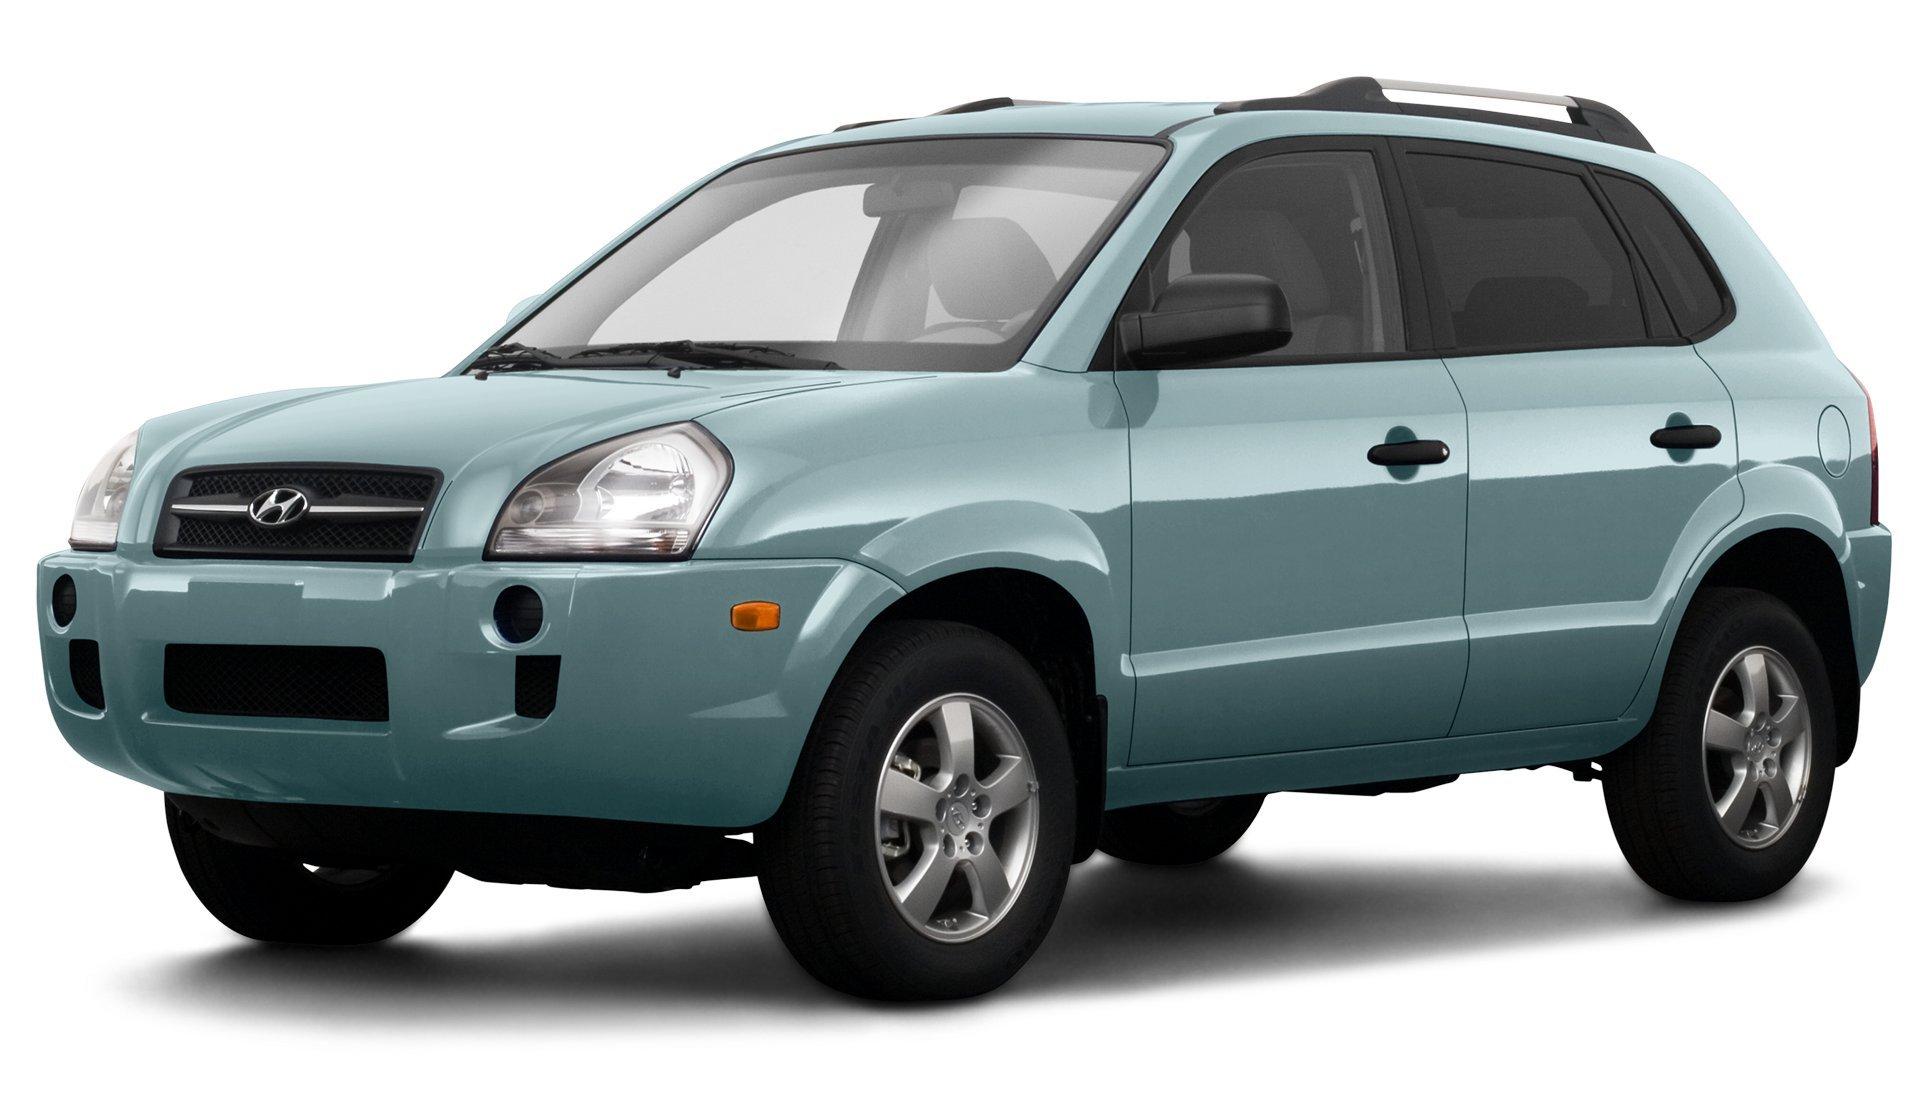 Amazon.com: 2008 Kia Sportage Reviews, Images, and Specs: Vehicles